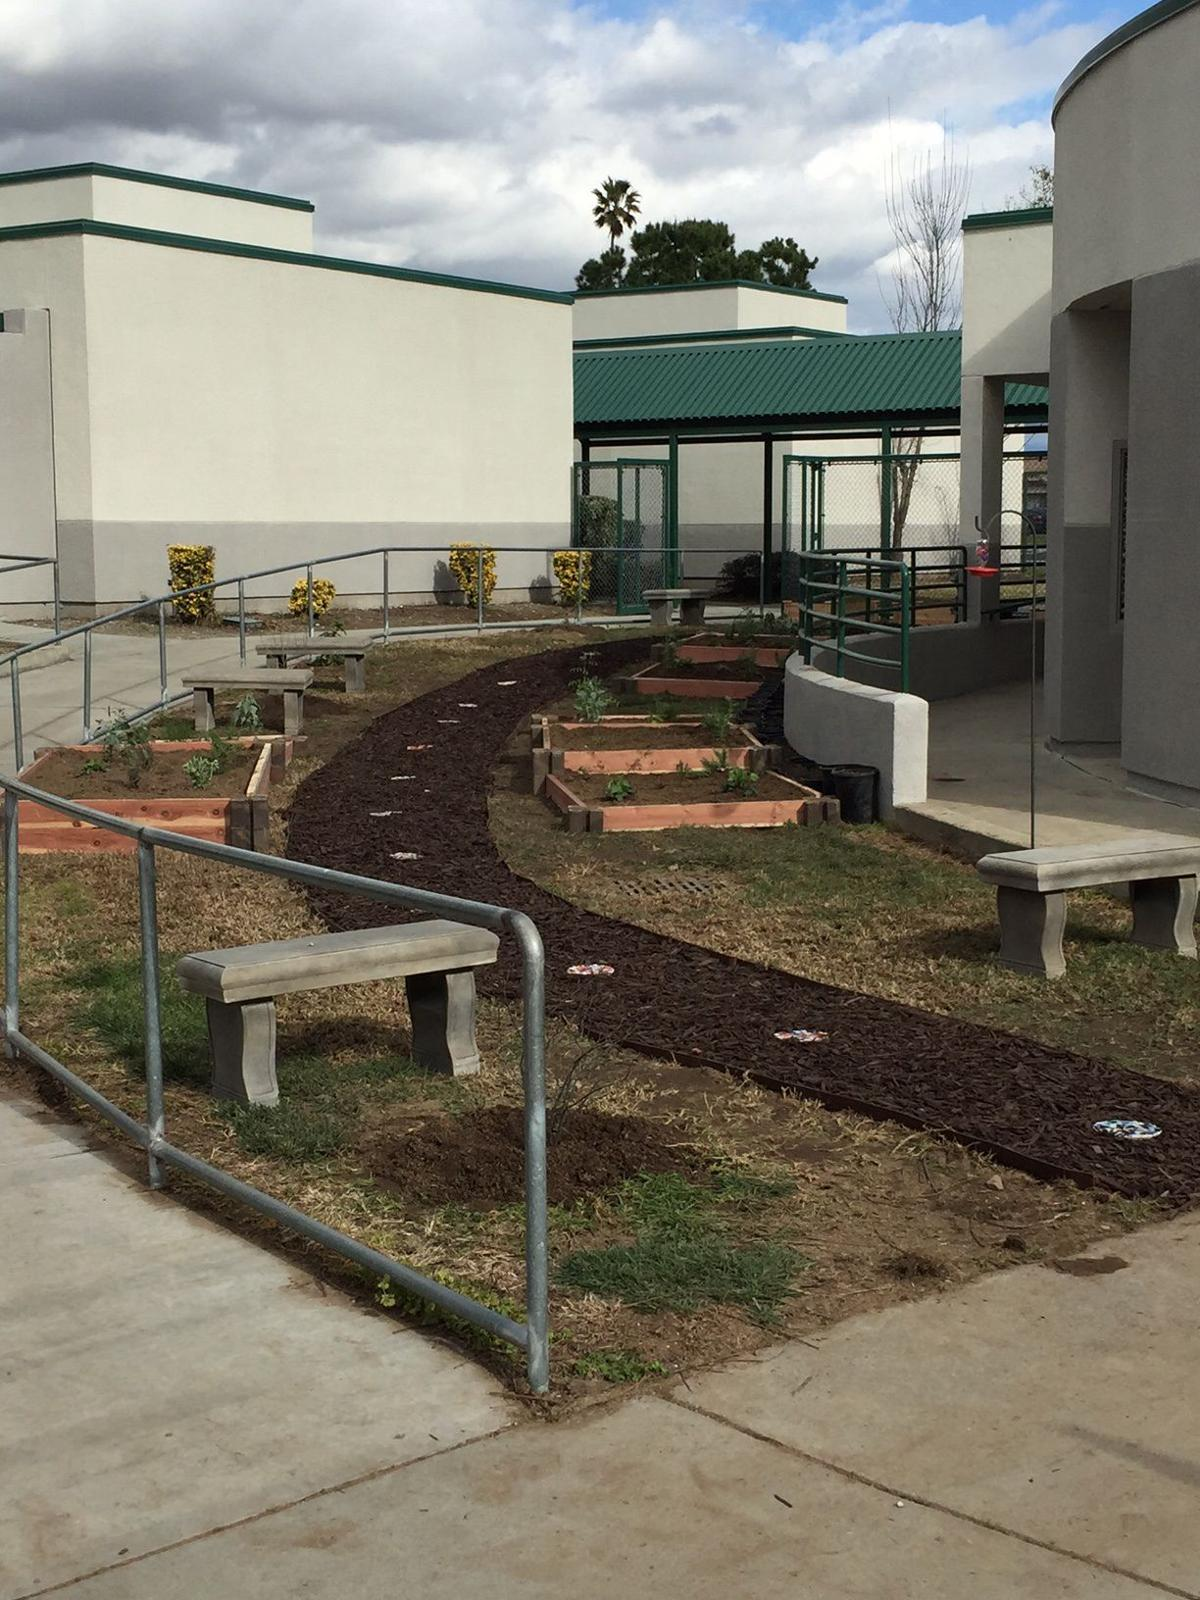 Mango Elementary School gets new reading garden thanks to grant ...